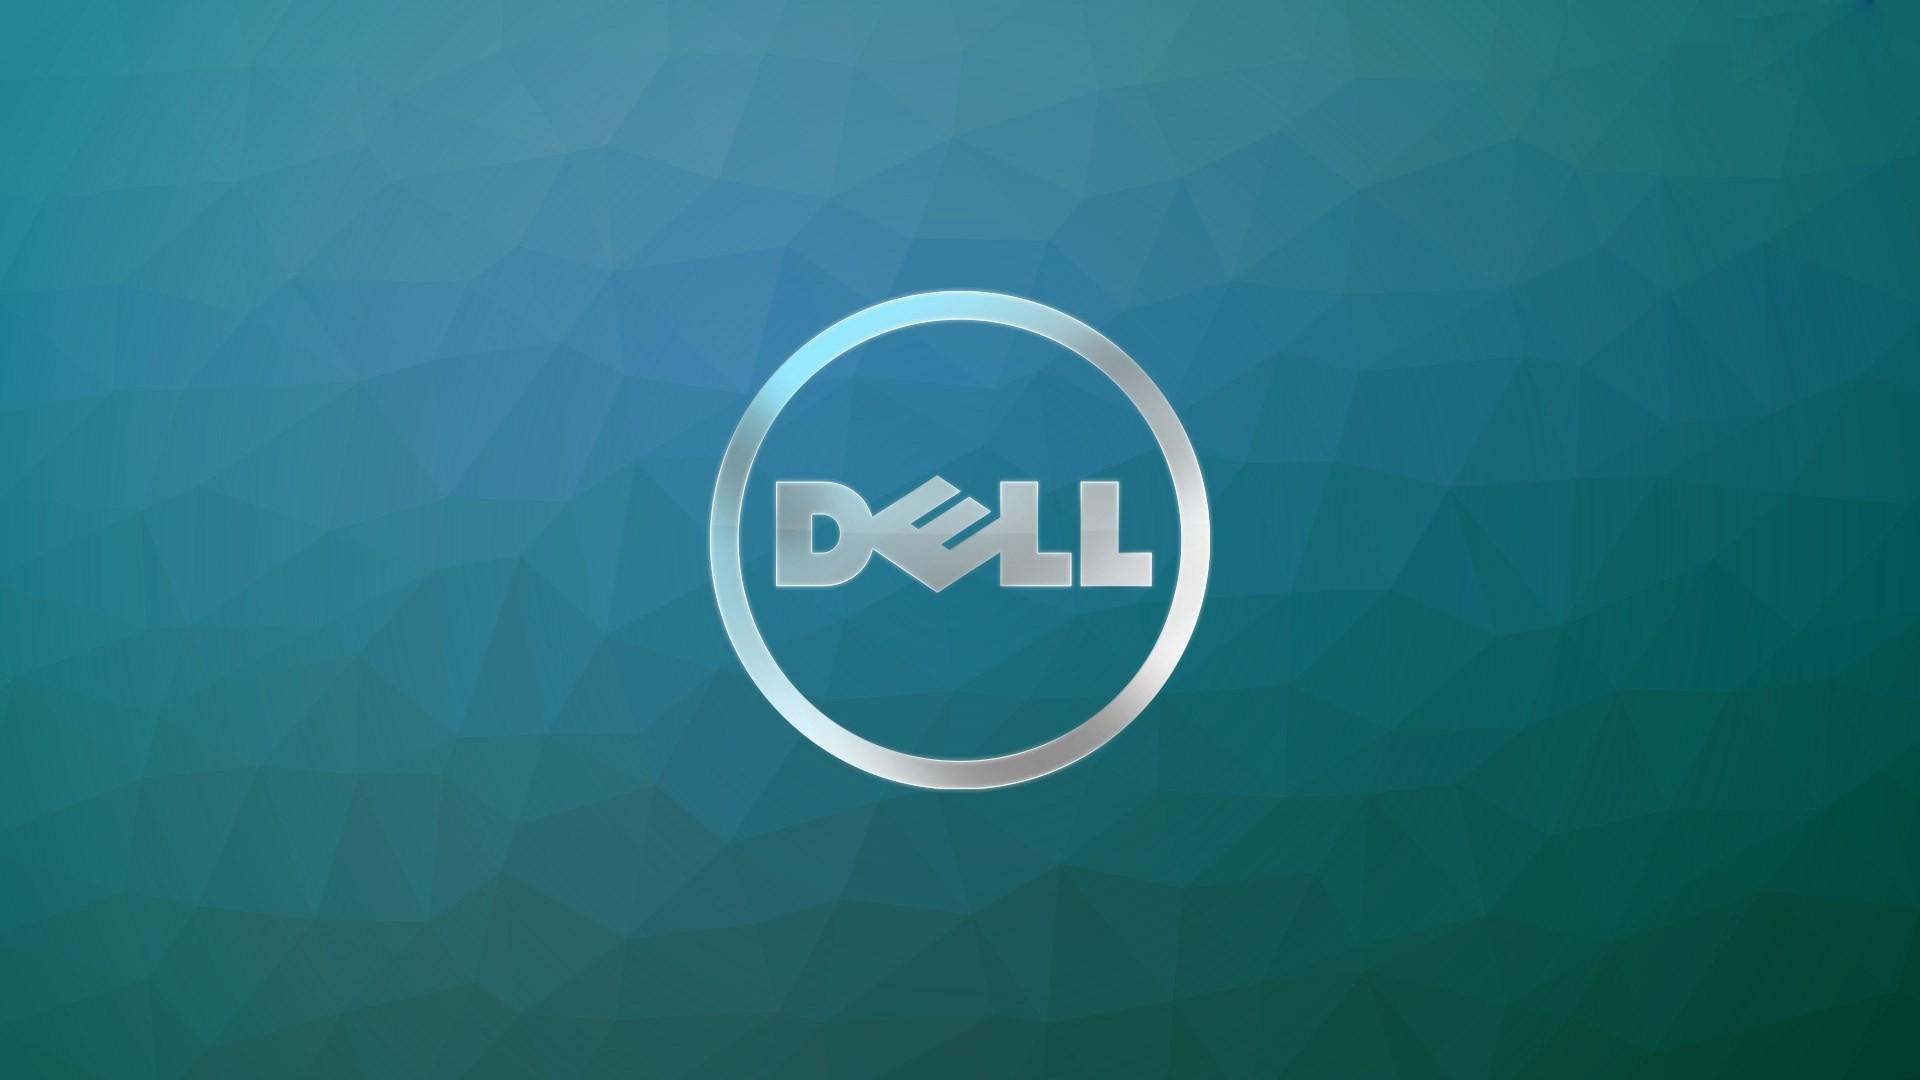 1920x1080 Wallpaper Dell Backlit Keyboard 1080p HD Upload At January